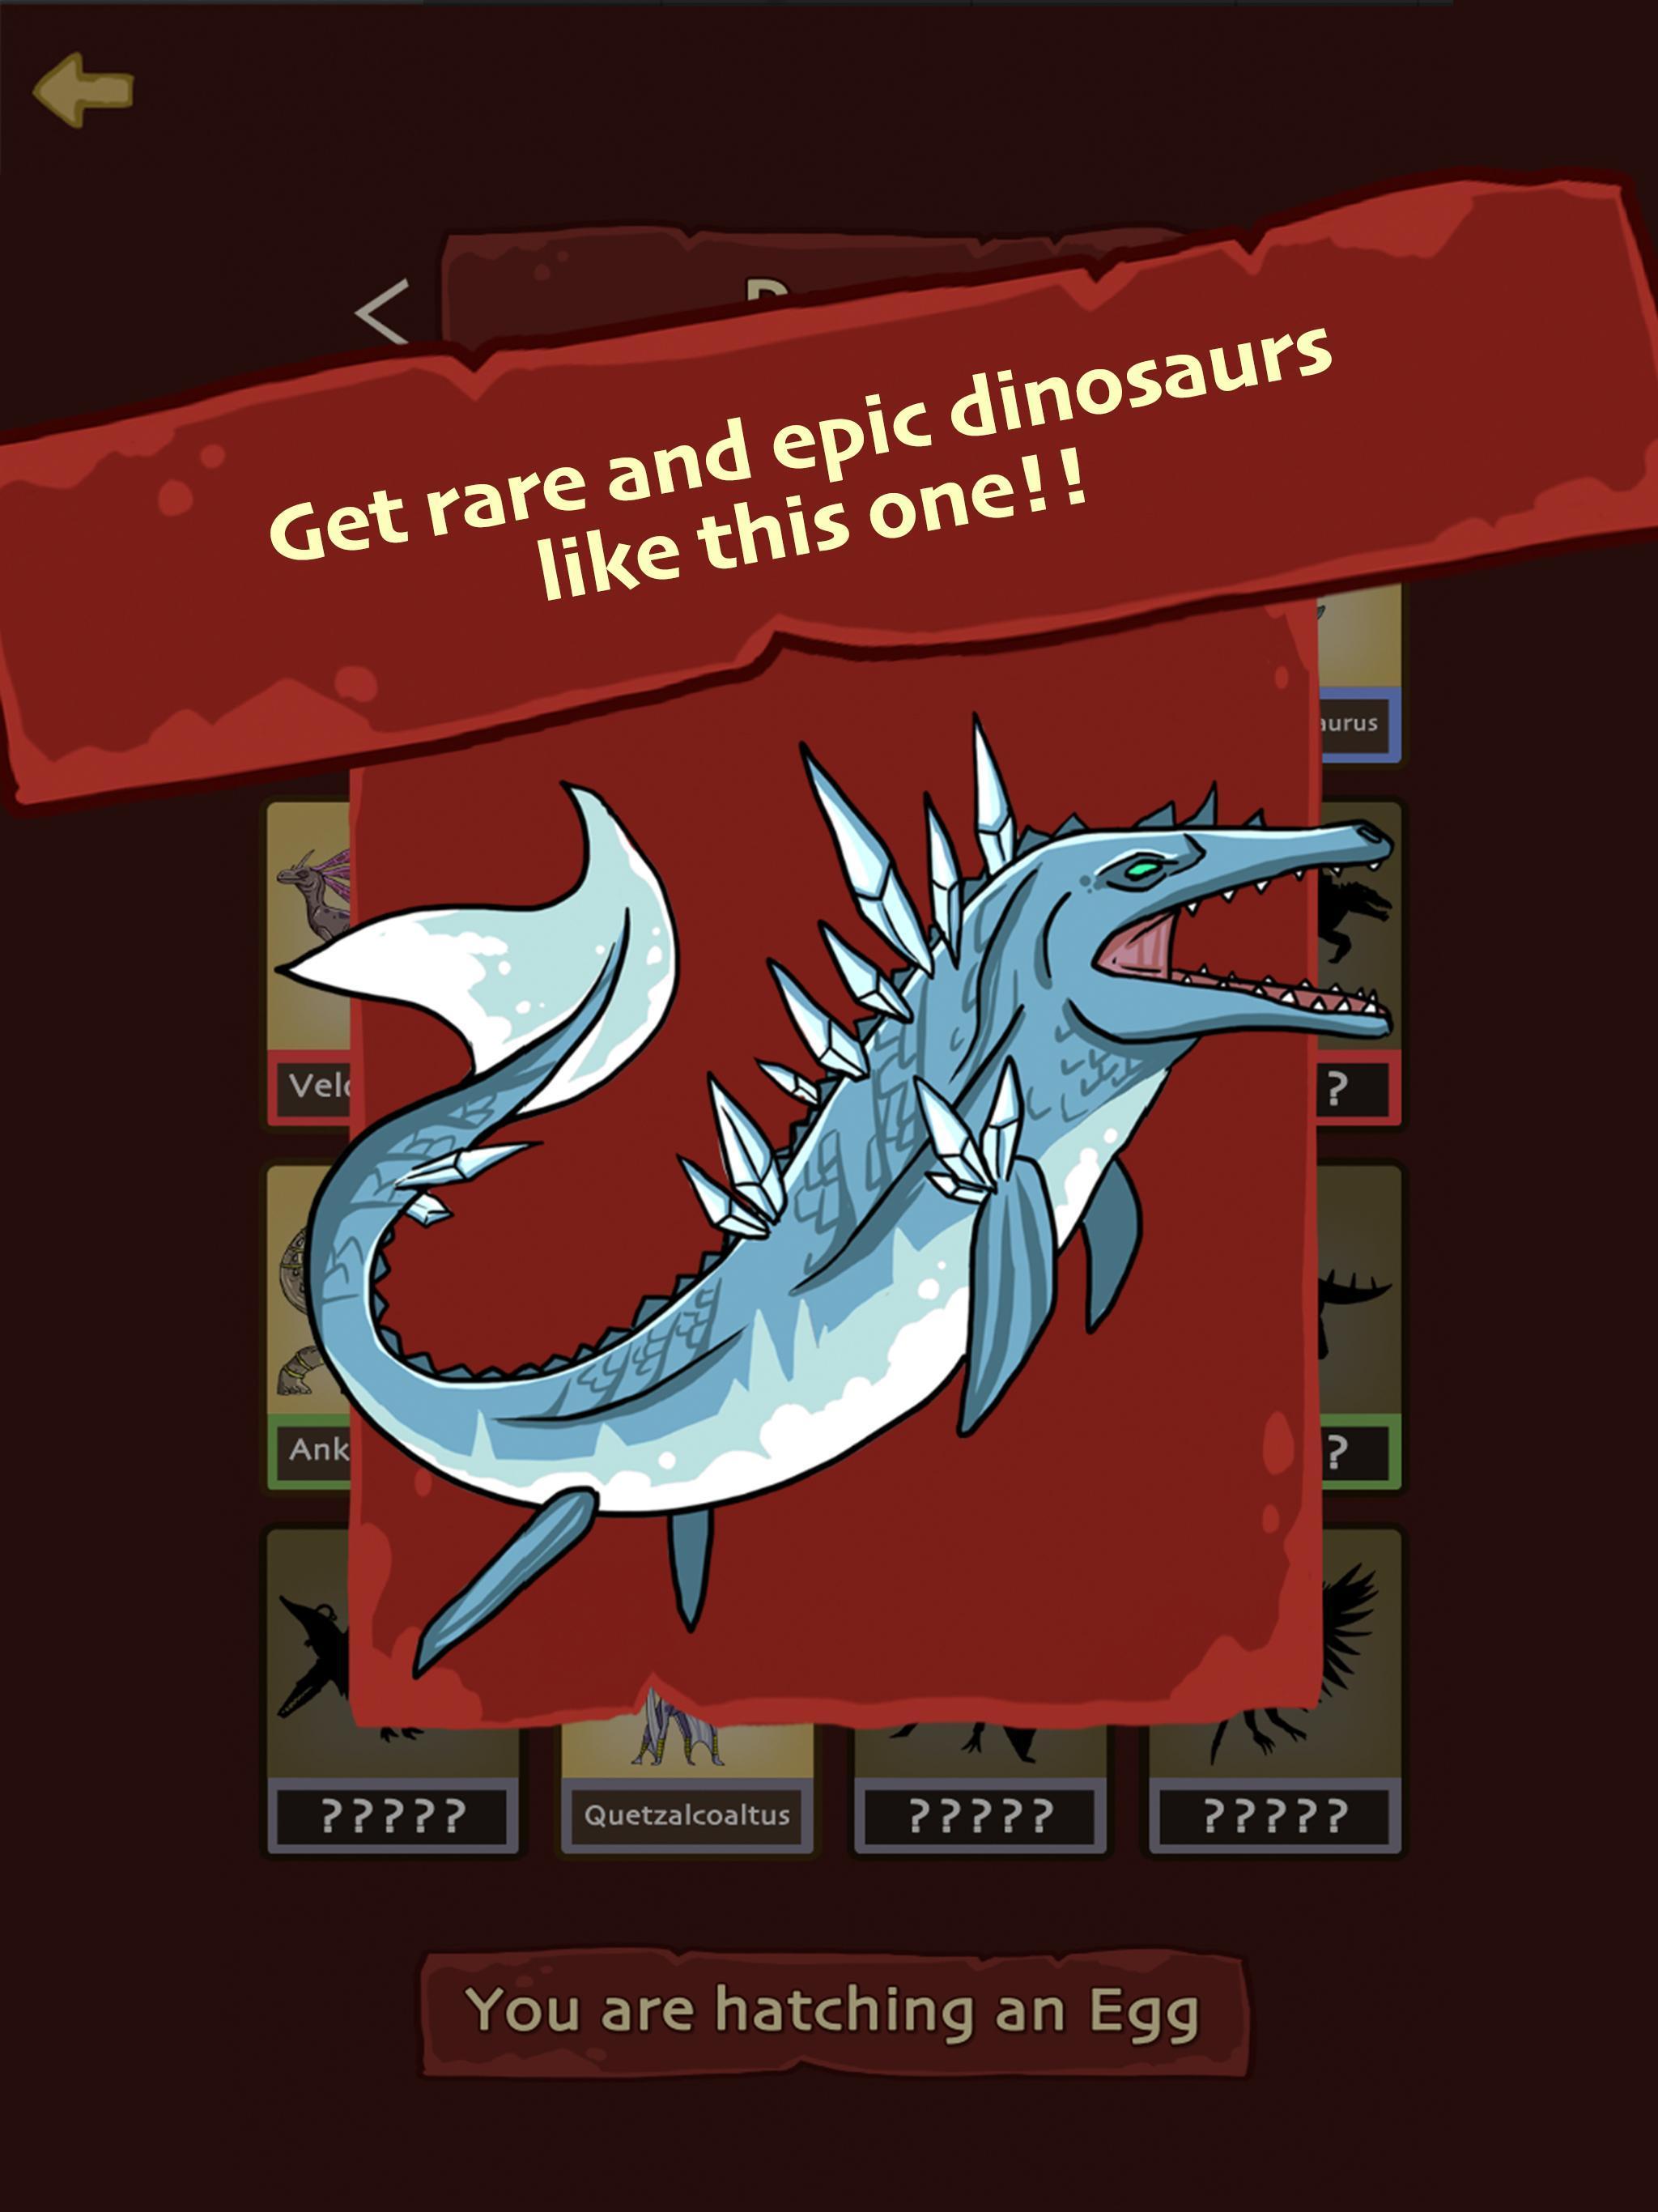 Hatch Dinosaur Eggs - Jurassic World Clicker Games 1.0.7 Screenshot 13